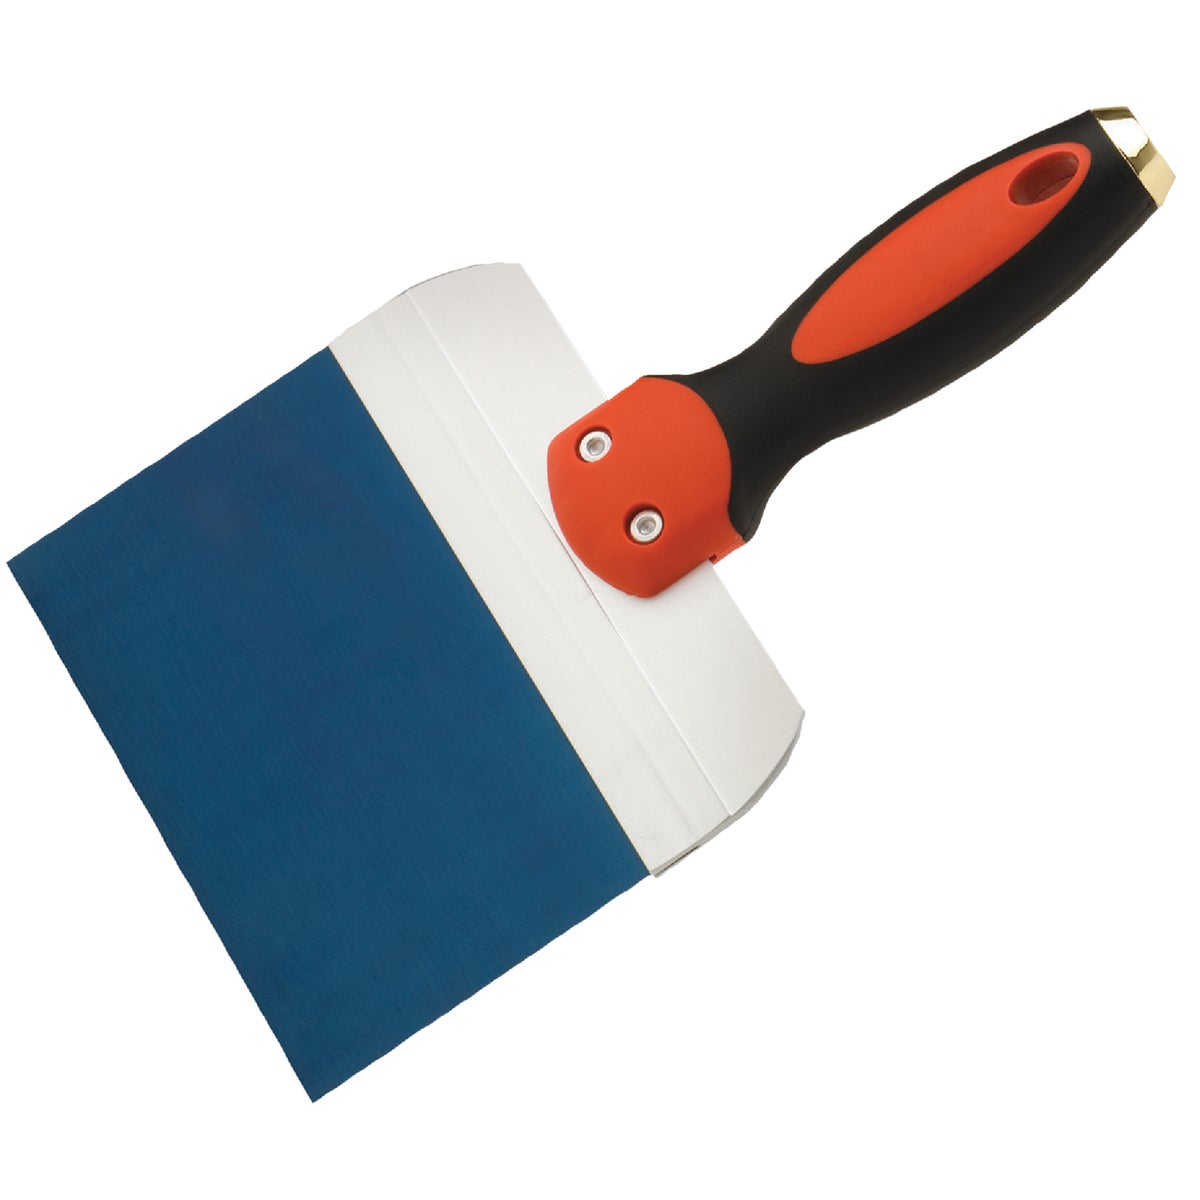 "6"" BLUE STL TAPING KNIFE"